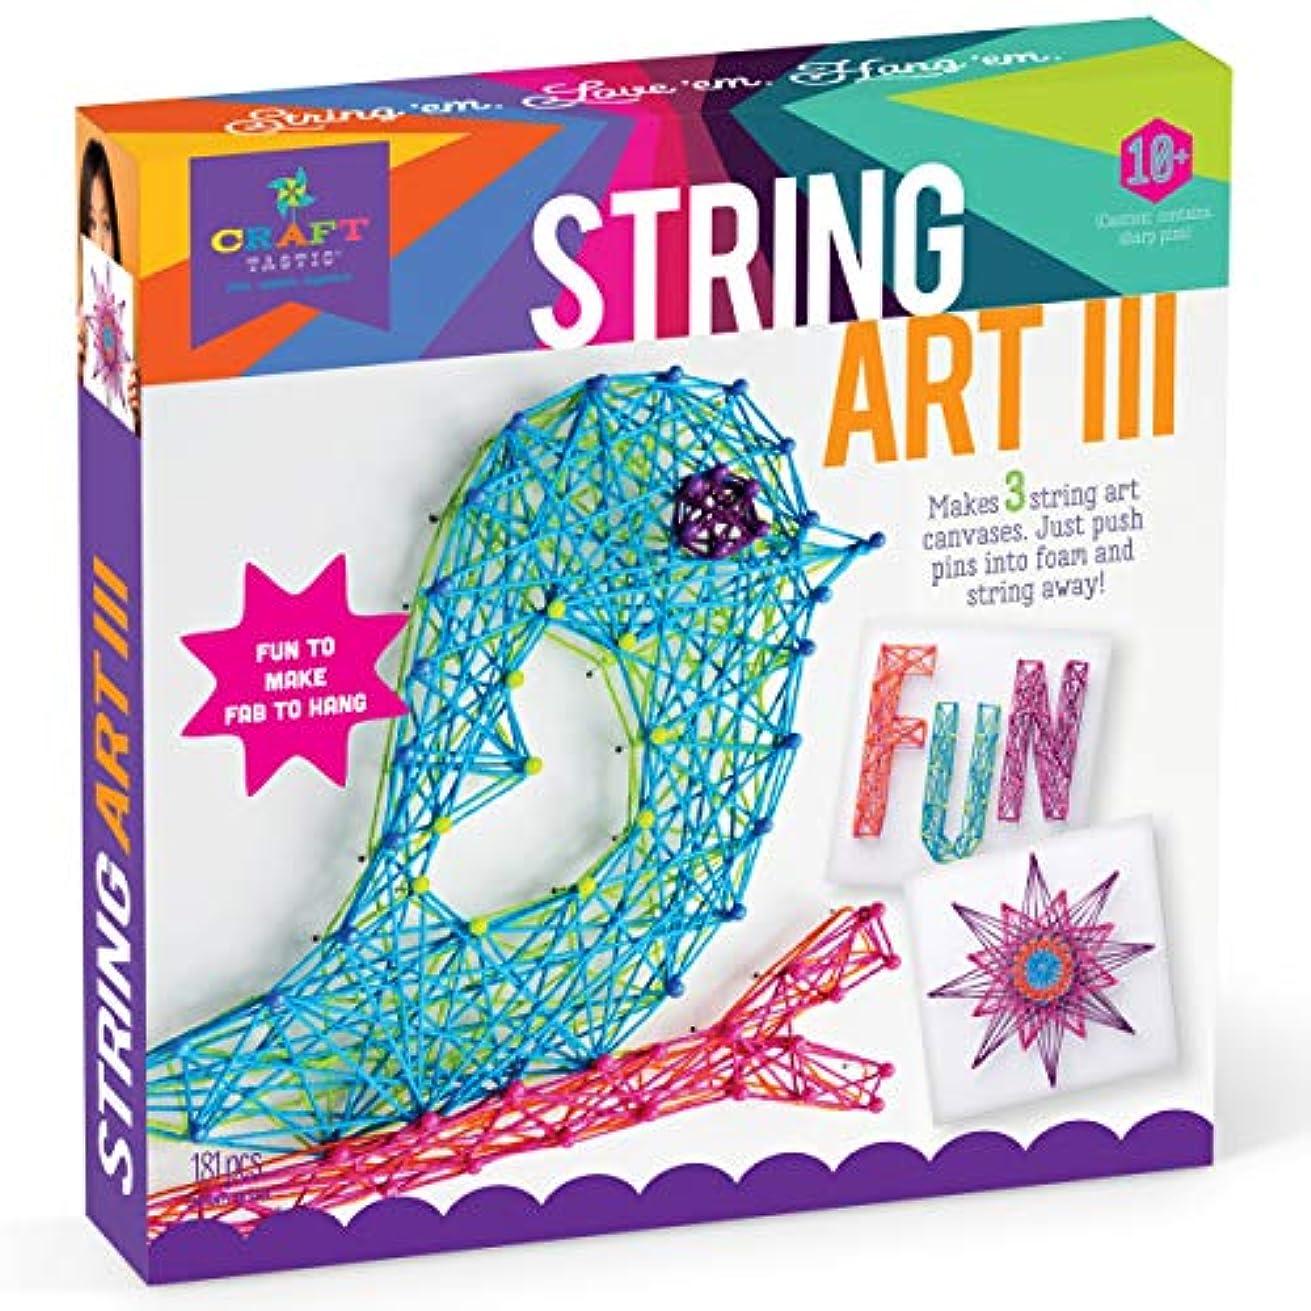 Craft-tastic – String Art Kit – Craft Kit Makes 3 Large String Art Canvases – Bird Edition